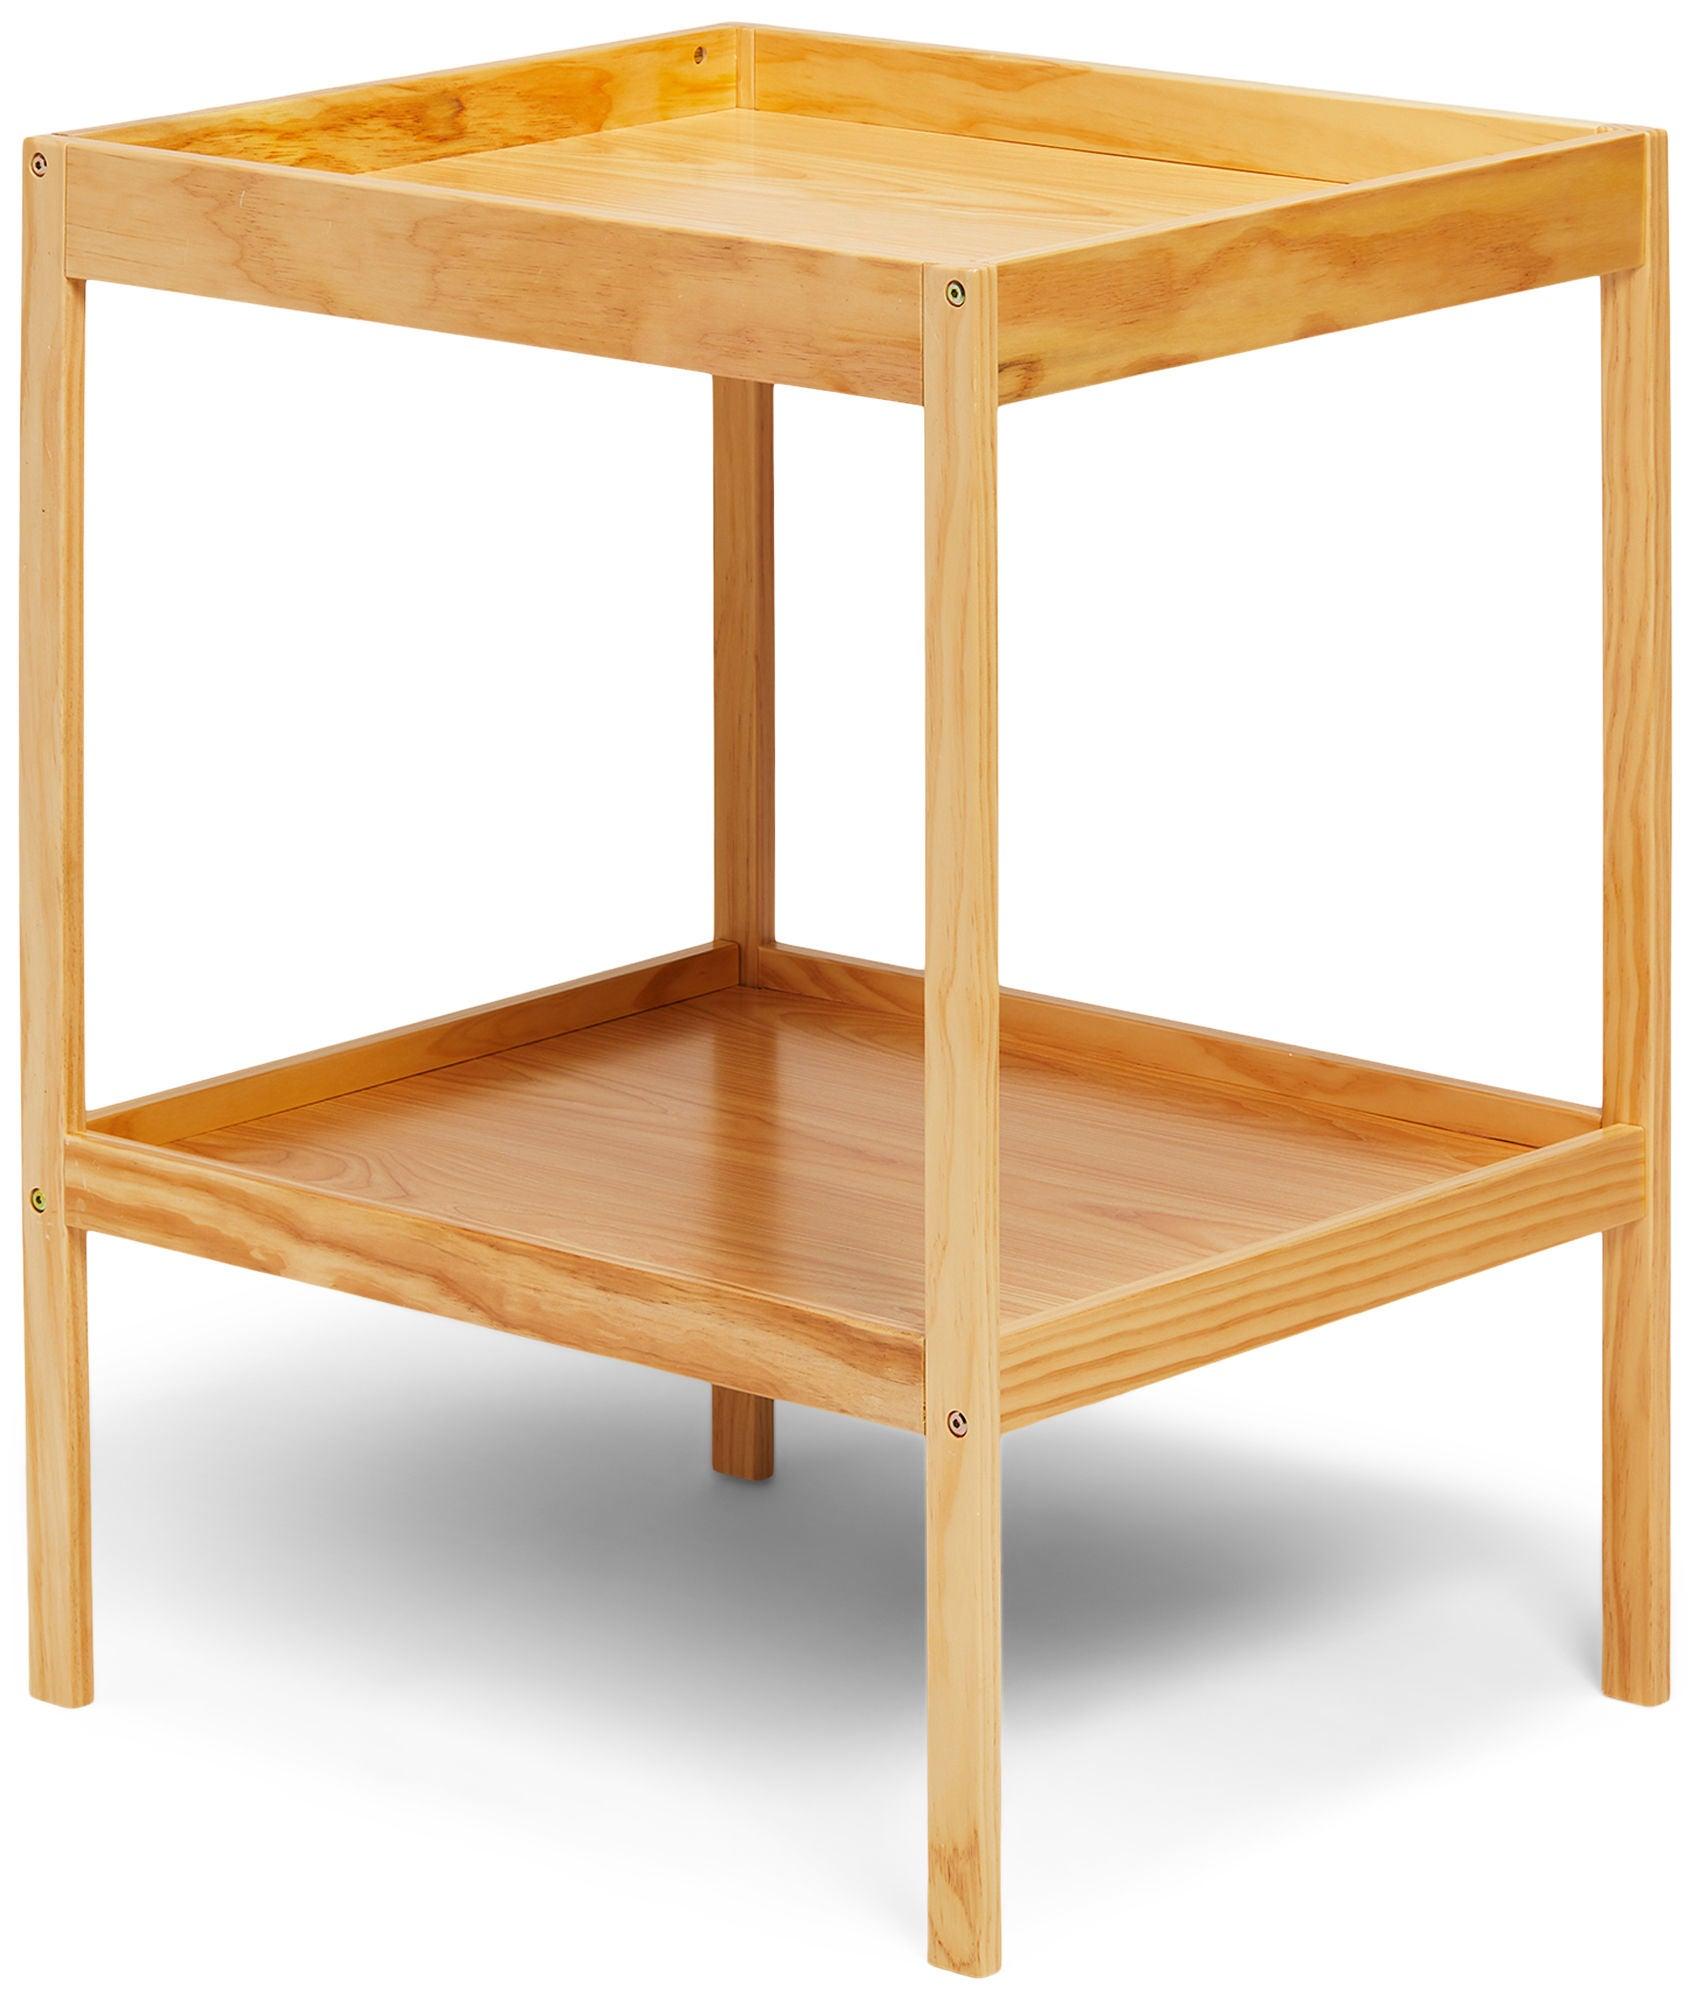 JLY Essential Hoitopöytä, Puu